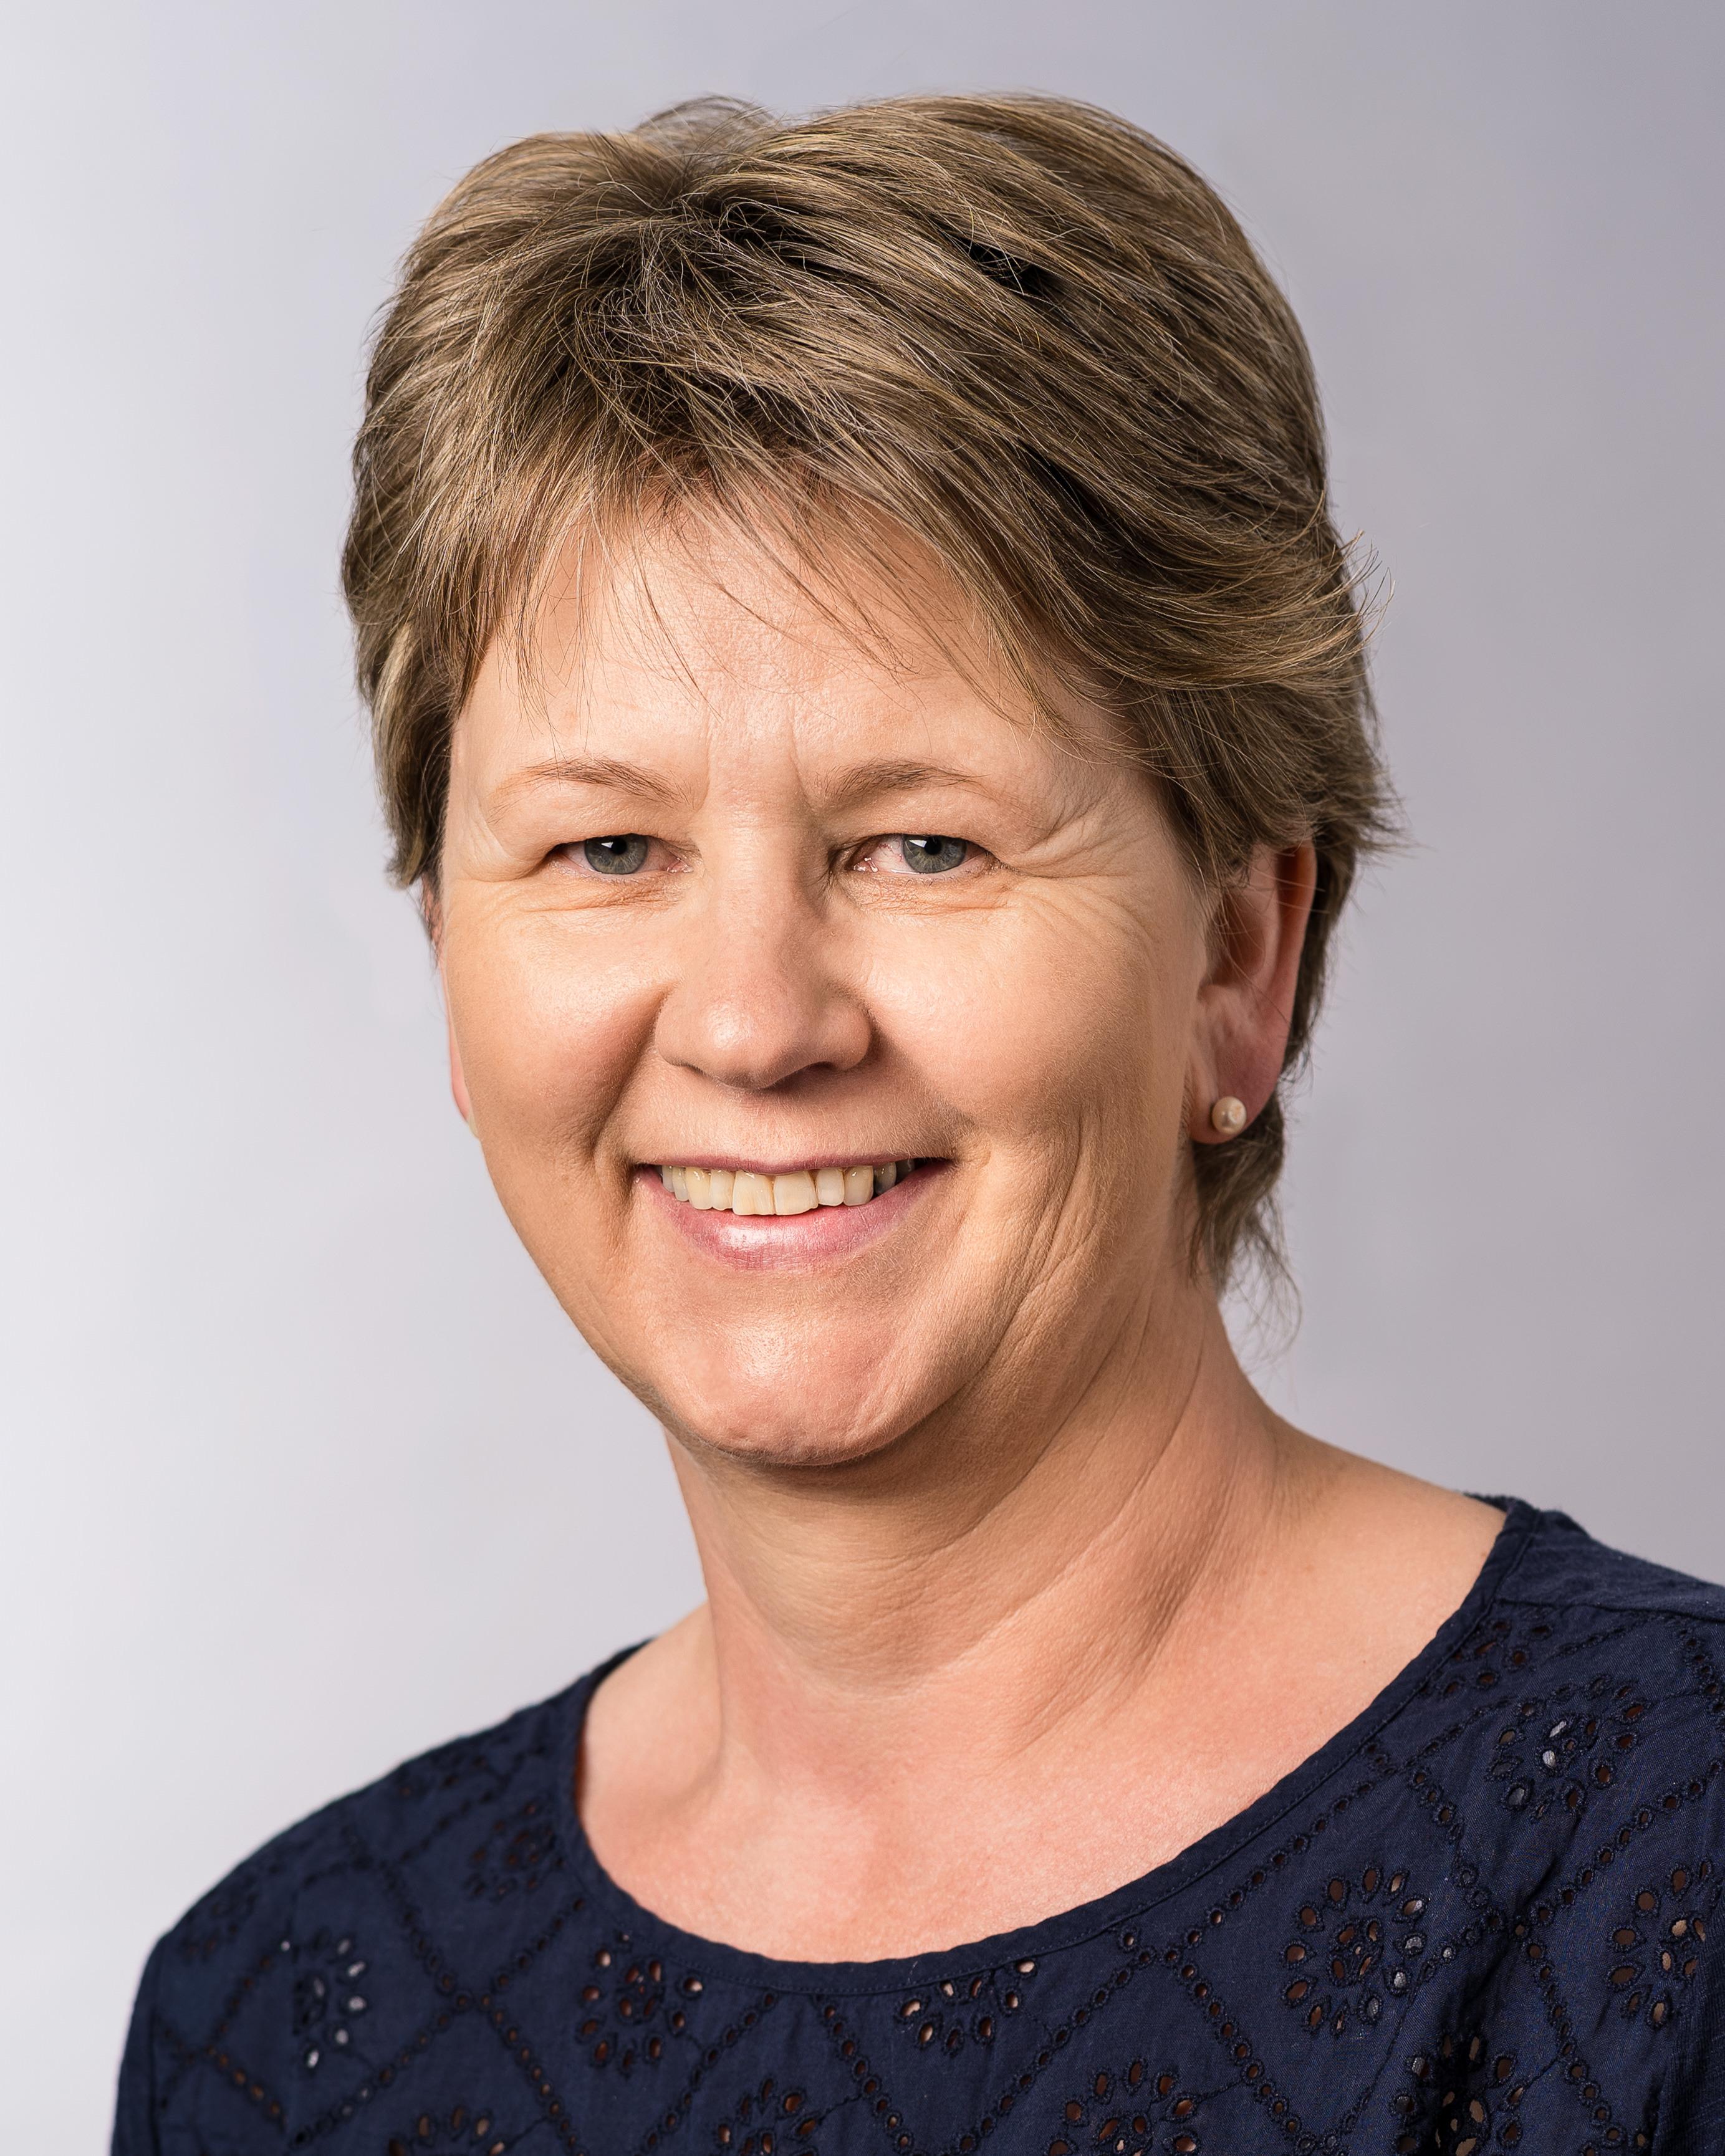 Katrin Mosimann